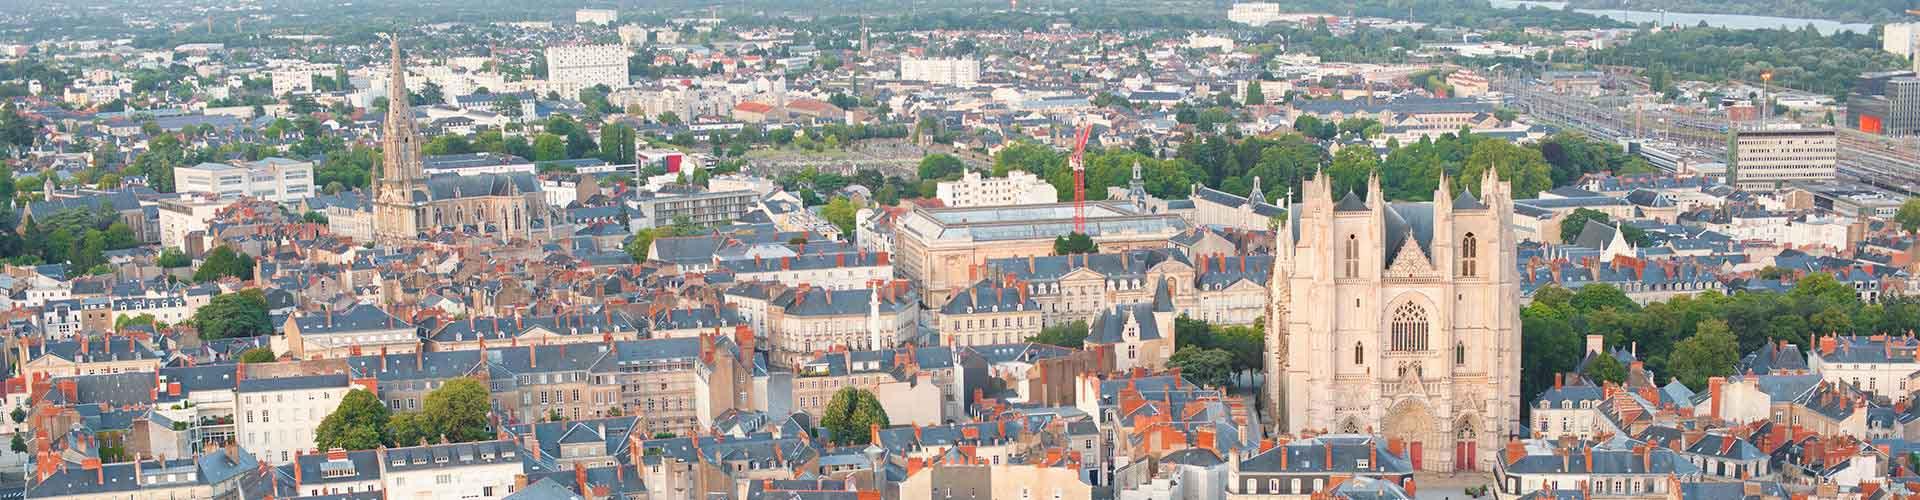 Nantes - Hoteles baratos en el distrito Route De Sainte-Luce. Mapas de Nantes, Fotos y comentarios de cada Hotel barato en Nantes.